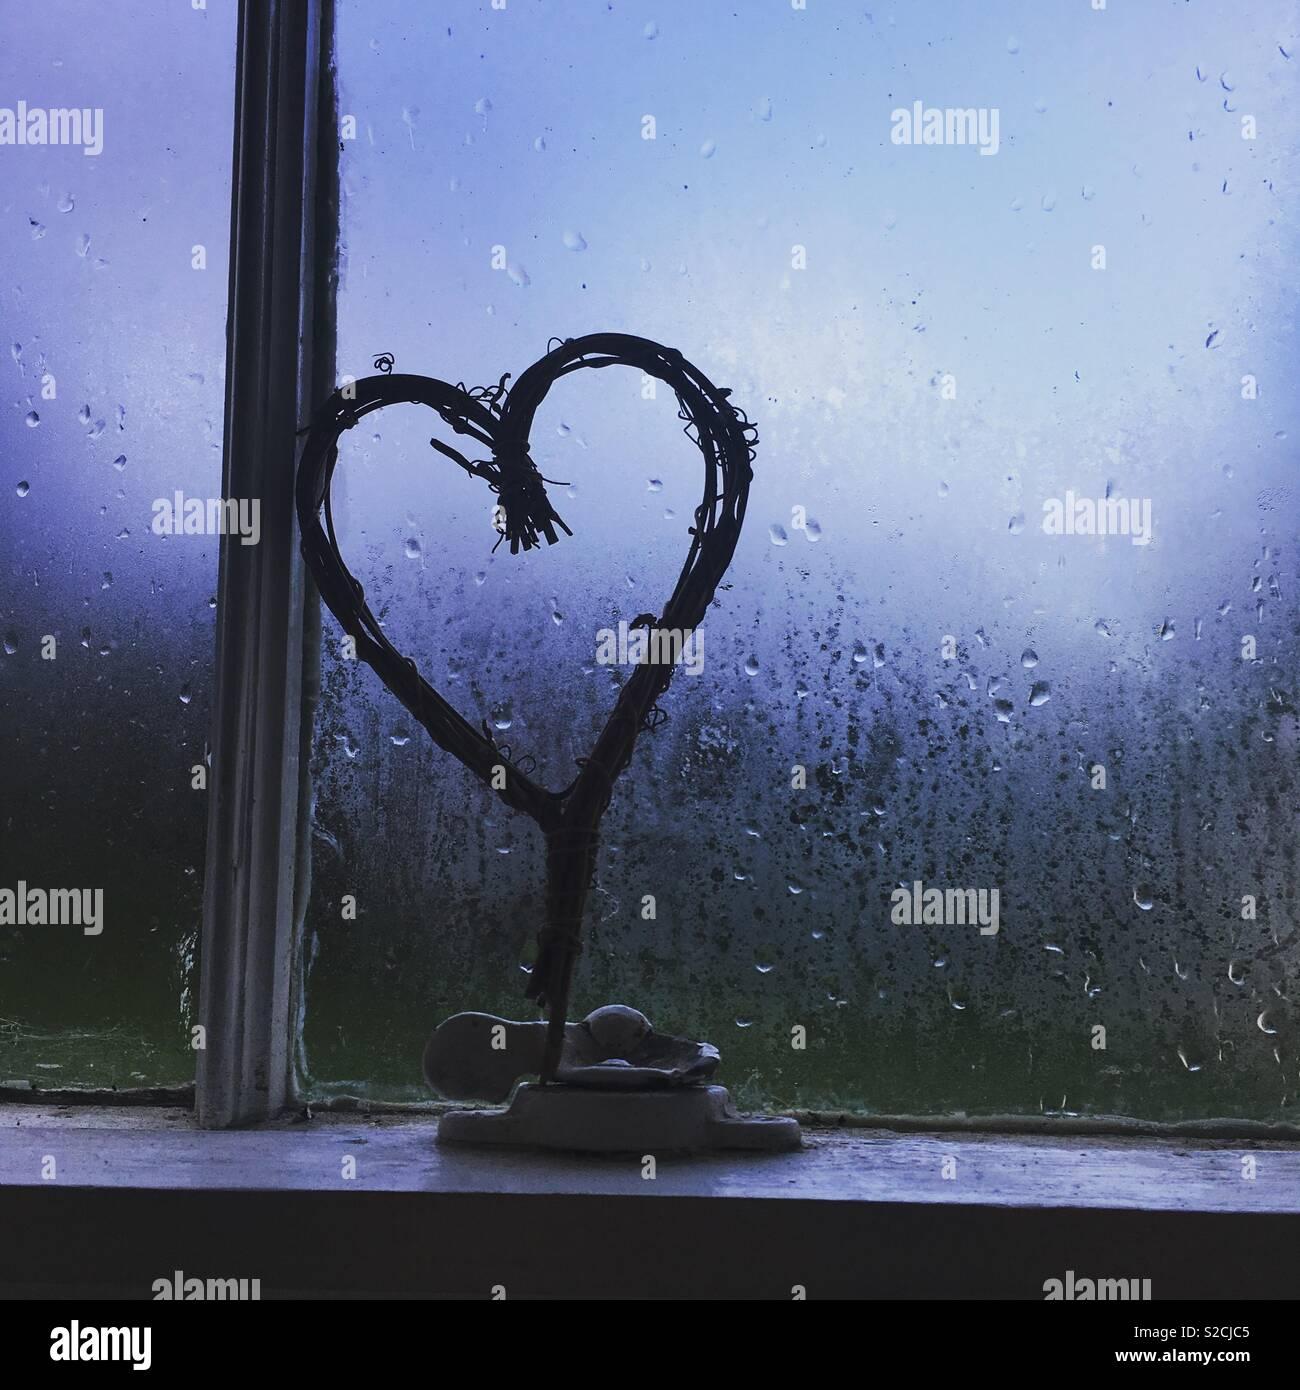 Corazón de lluvia Imagen De Stock